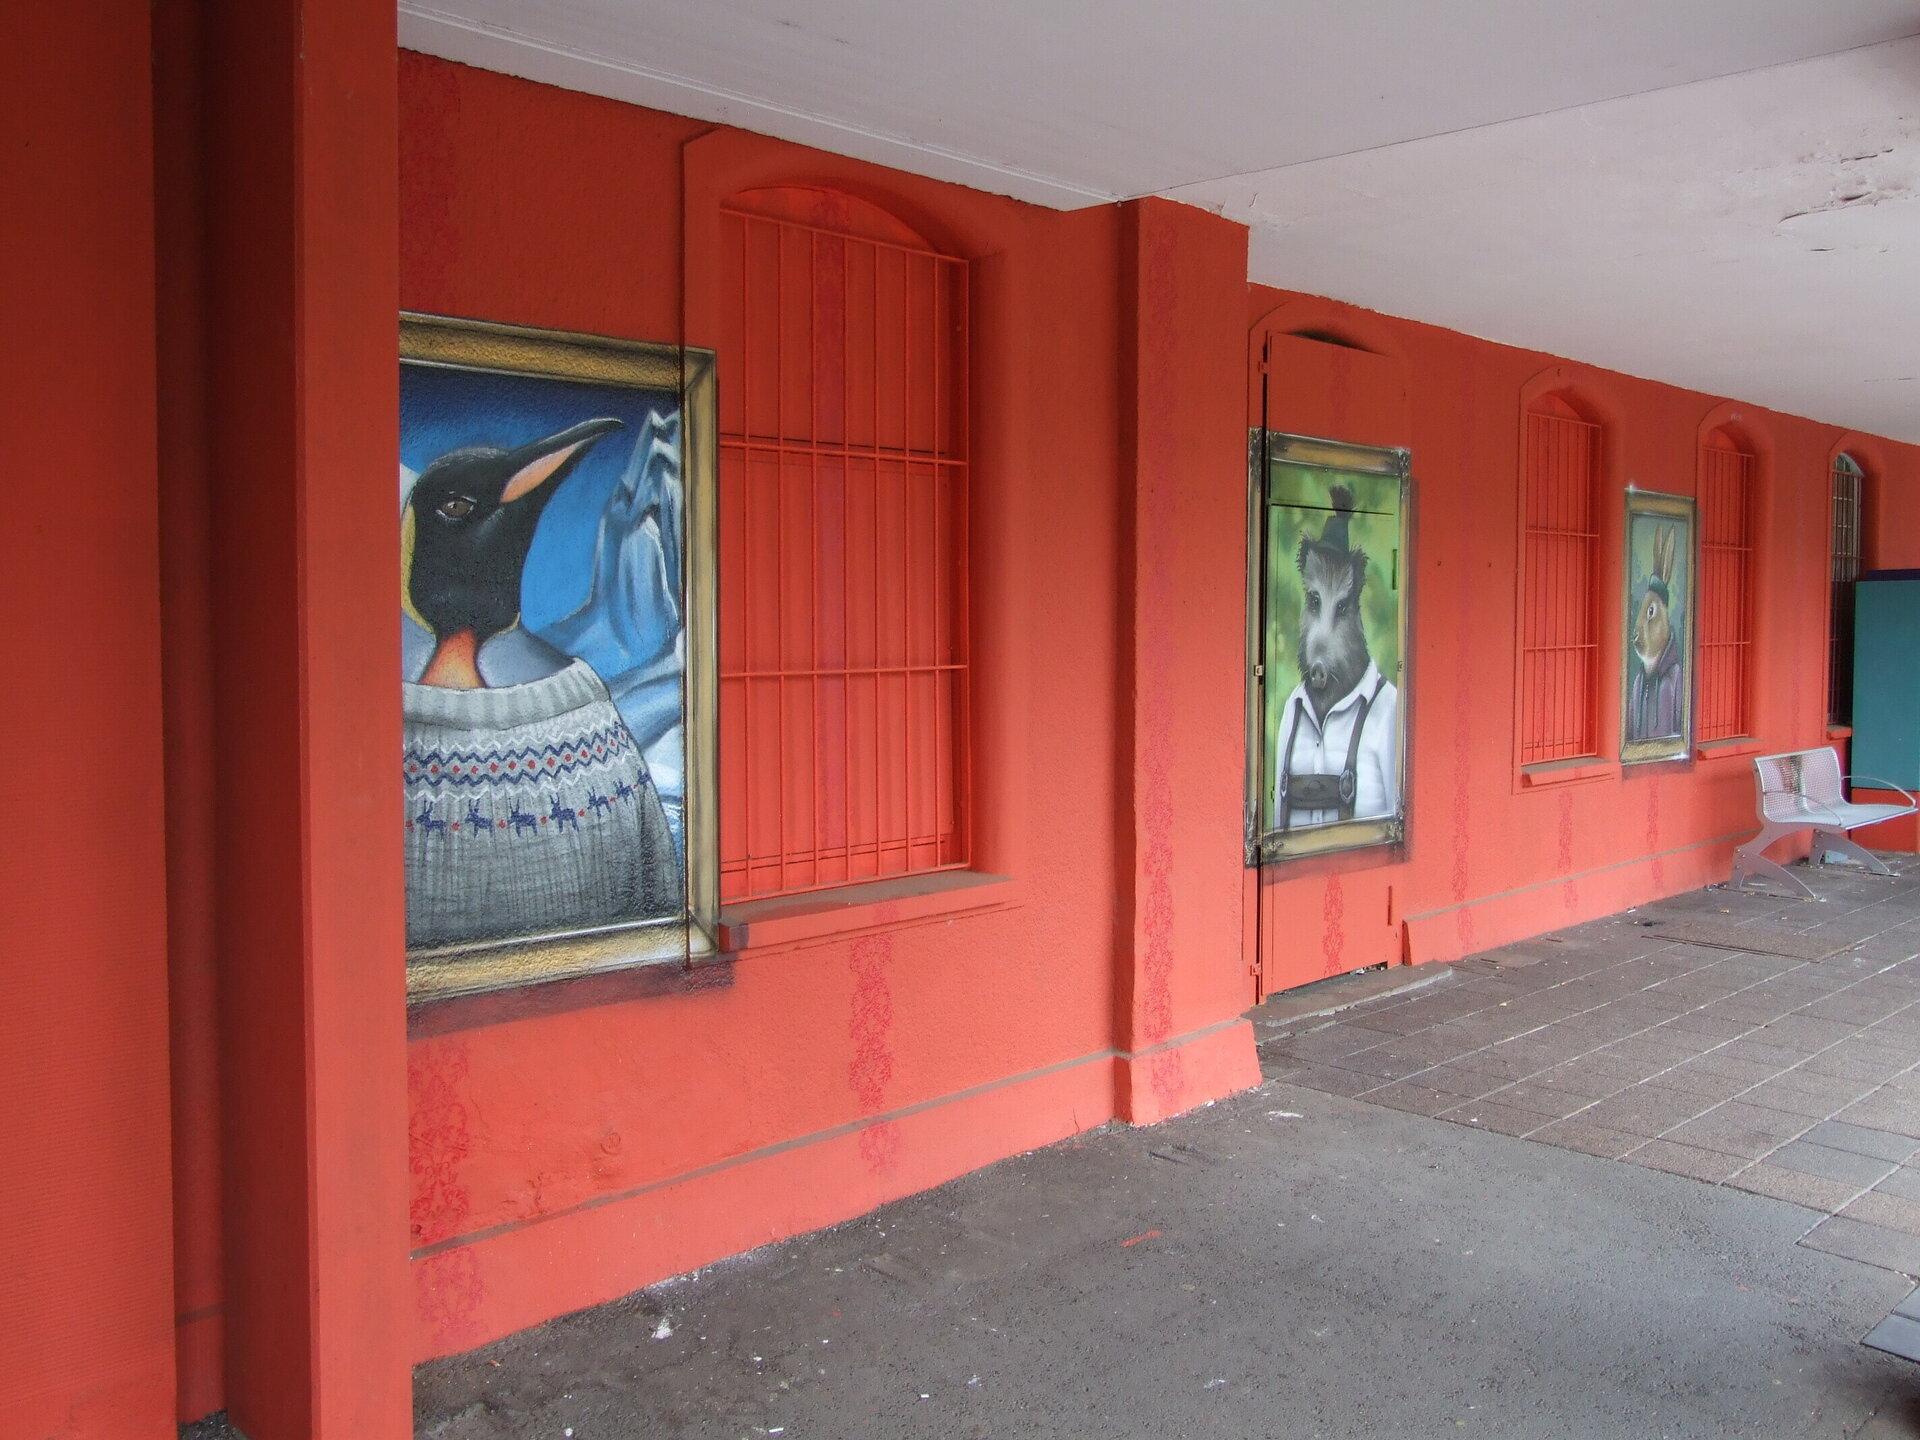 Kunstwerk am Bahnhof Ost